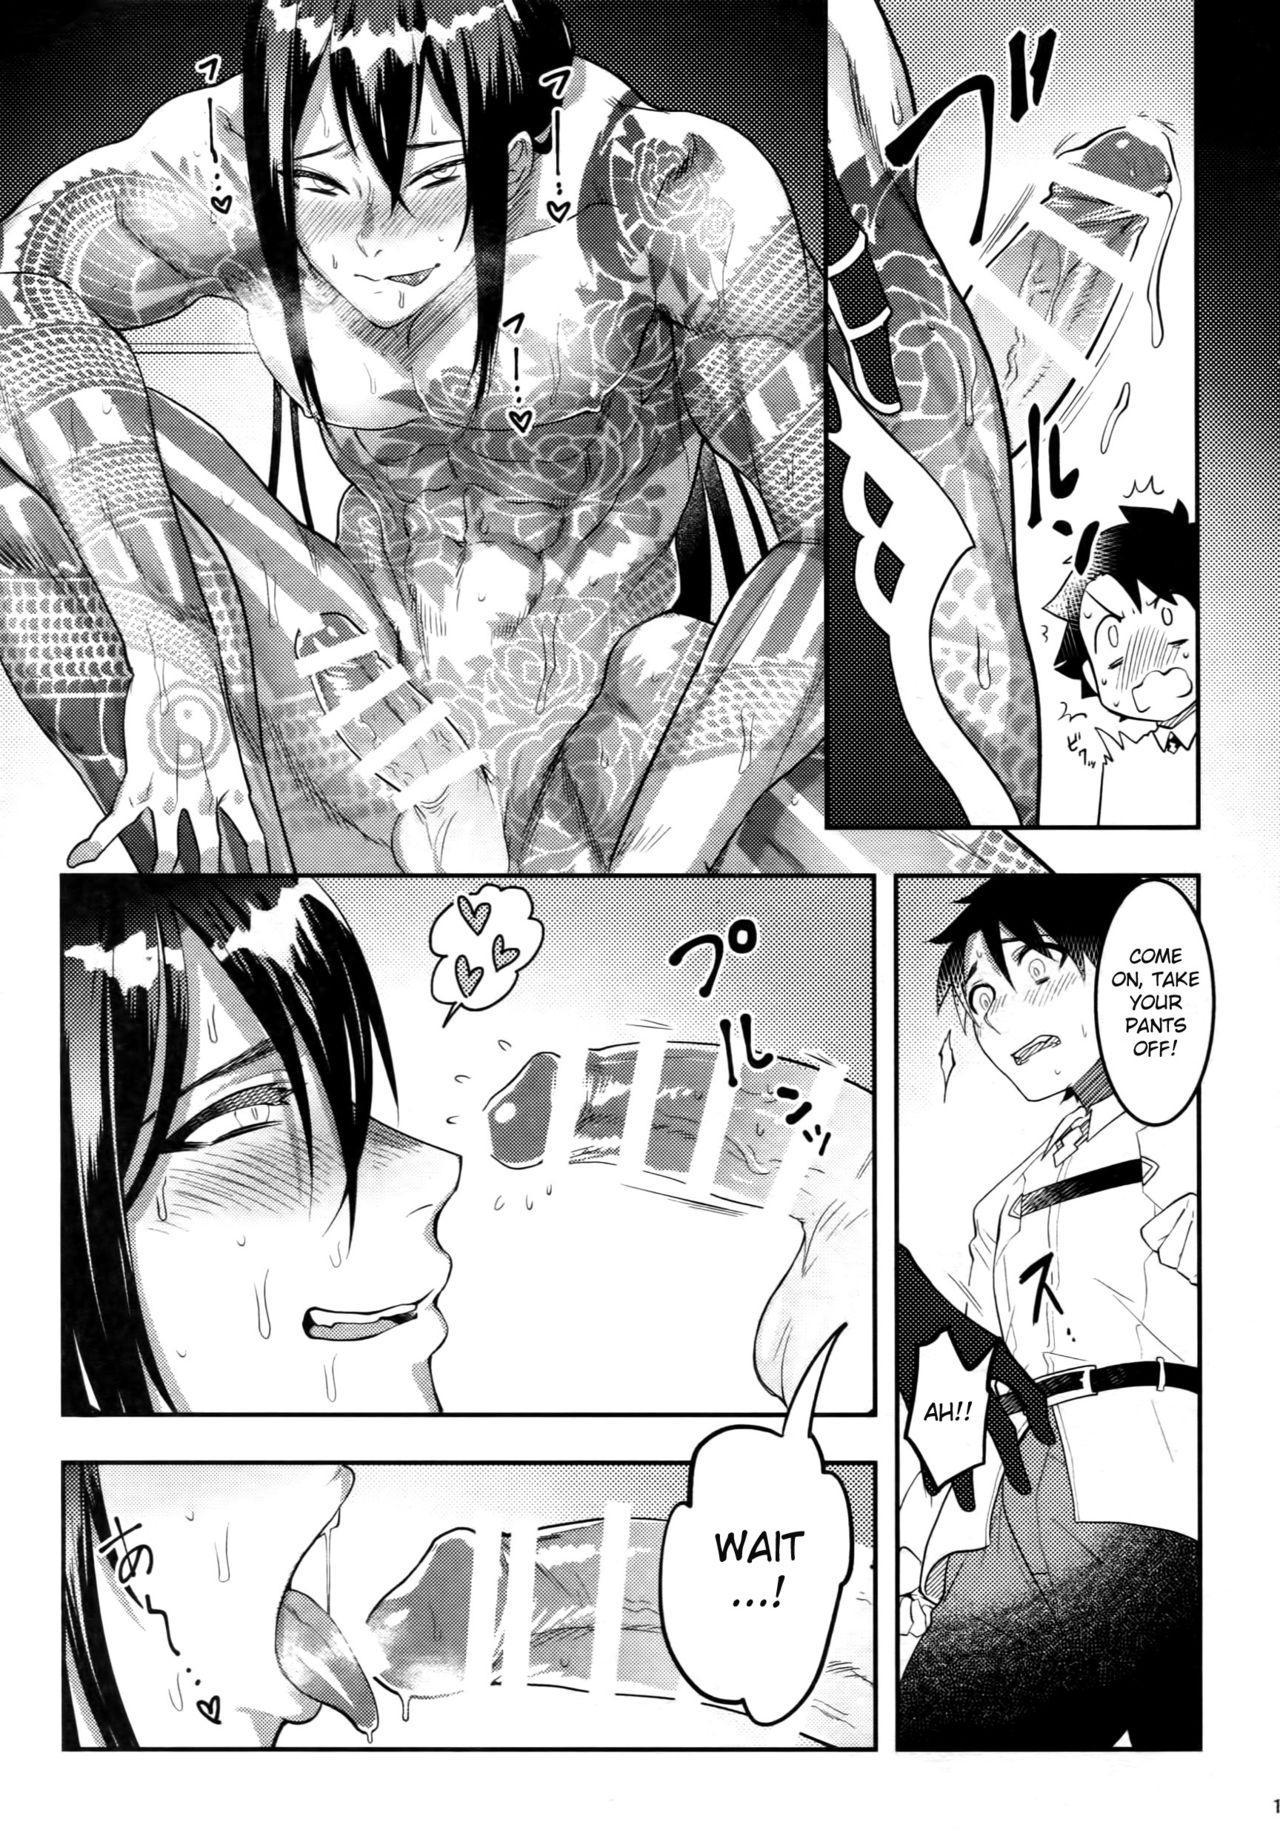 (Super ROOT 4 to 5 2019) [xxkorori (Ko Tora)] Kando 500-bai Yami no Kyoukaku Nonstop Namahame 24-ji | 500-times Enhanced 24-hour Nonstop Raw Sex Session with the Guest of Darkness (Fate/Grand Order) [English] [MintVoid] 10